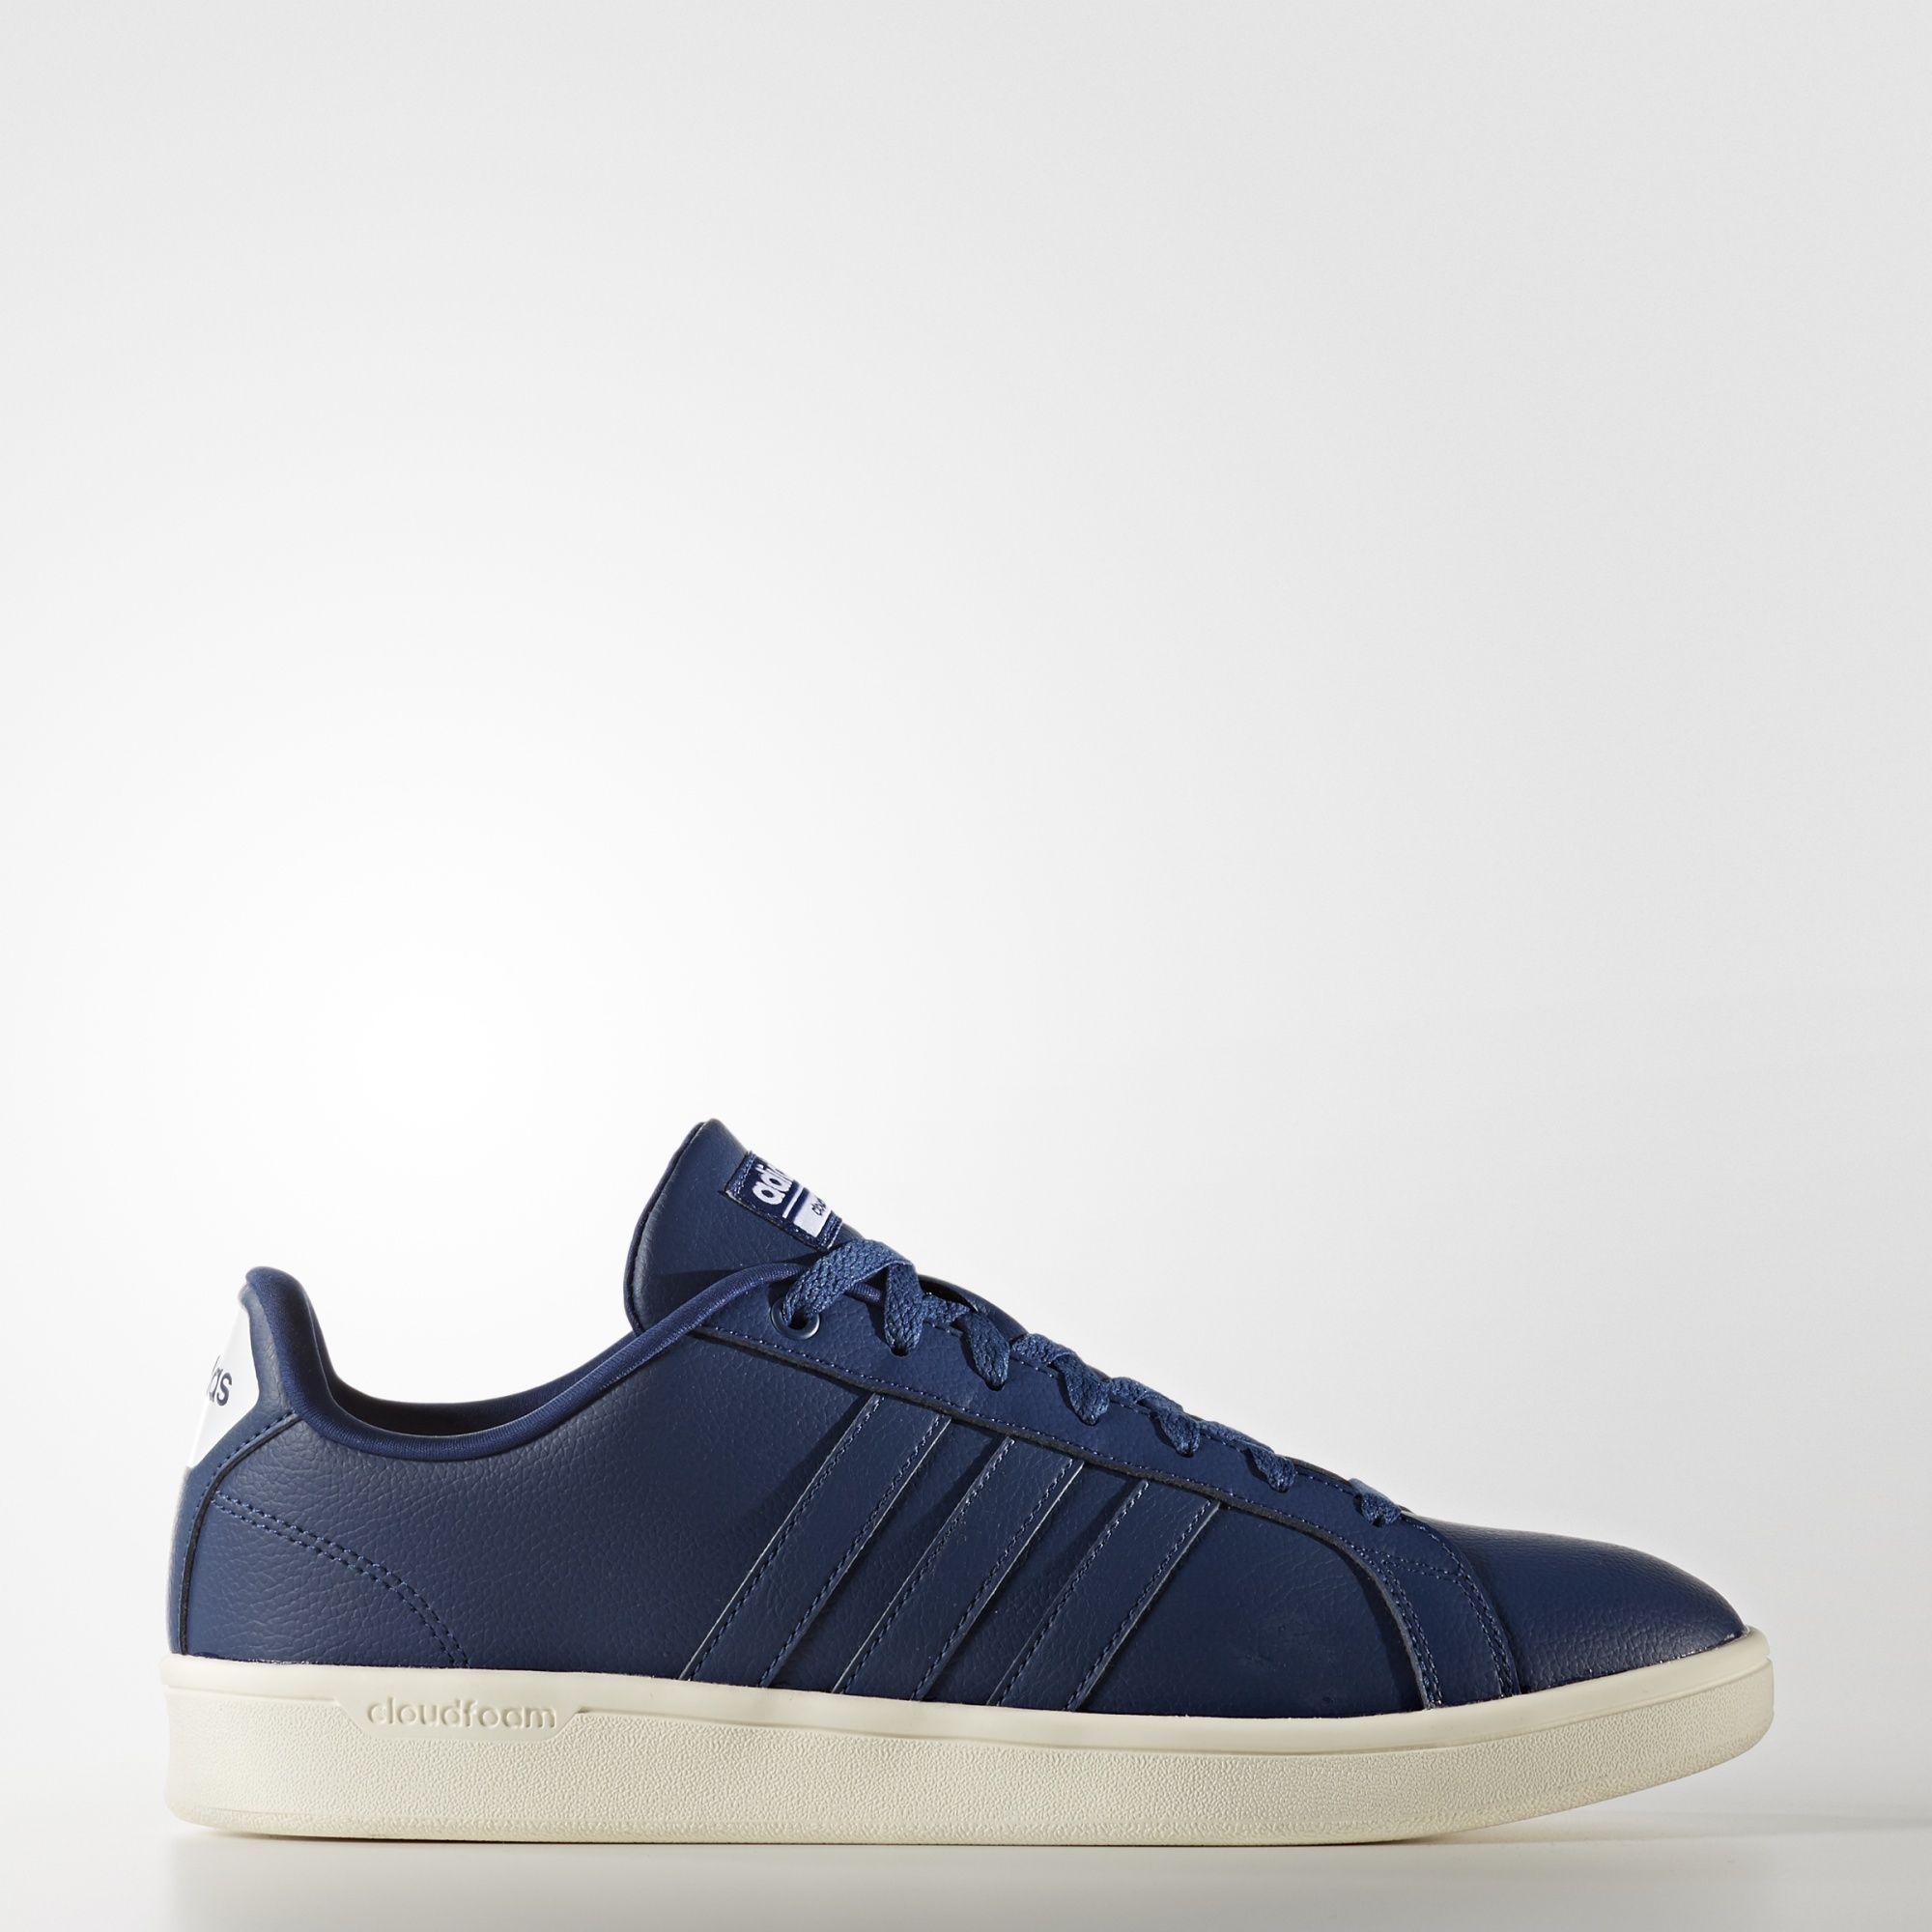 adidas Chaussure Cloudfoam Advantage | Chaussure, Adidas, Bleu